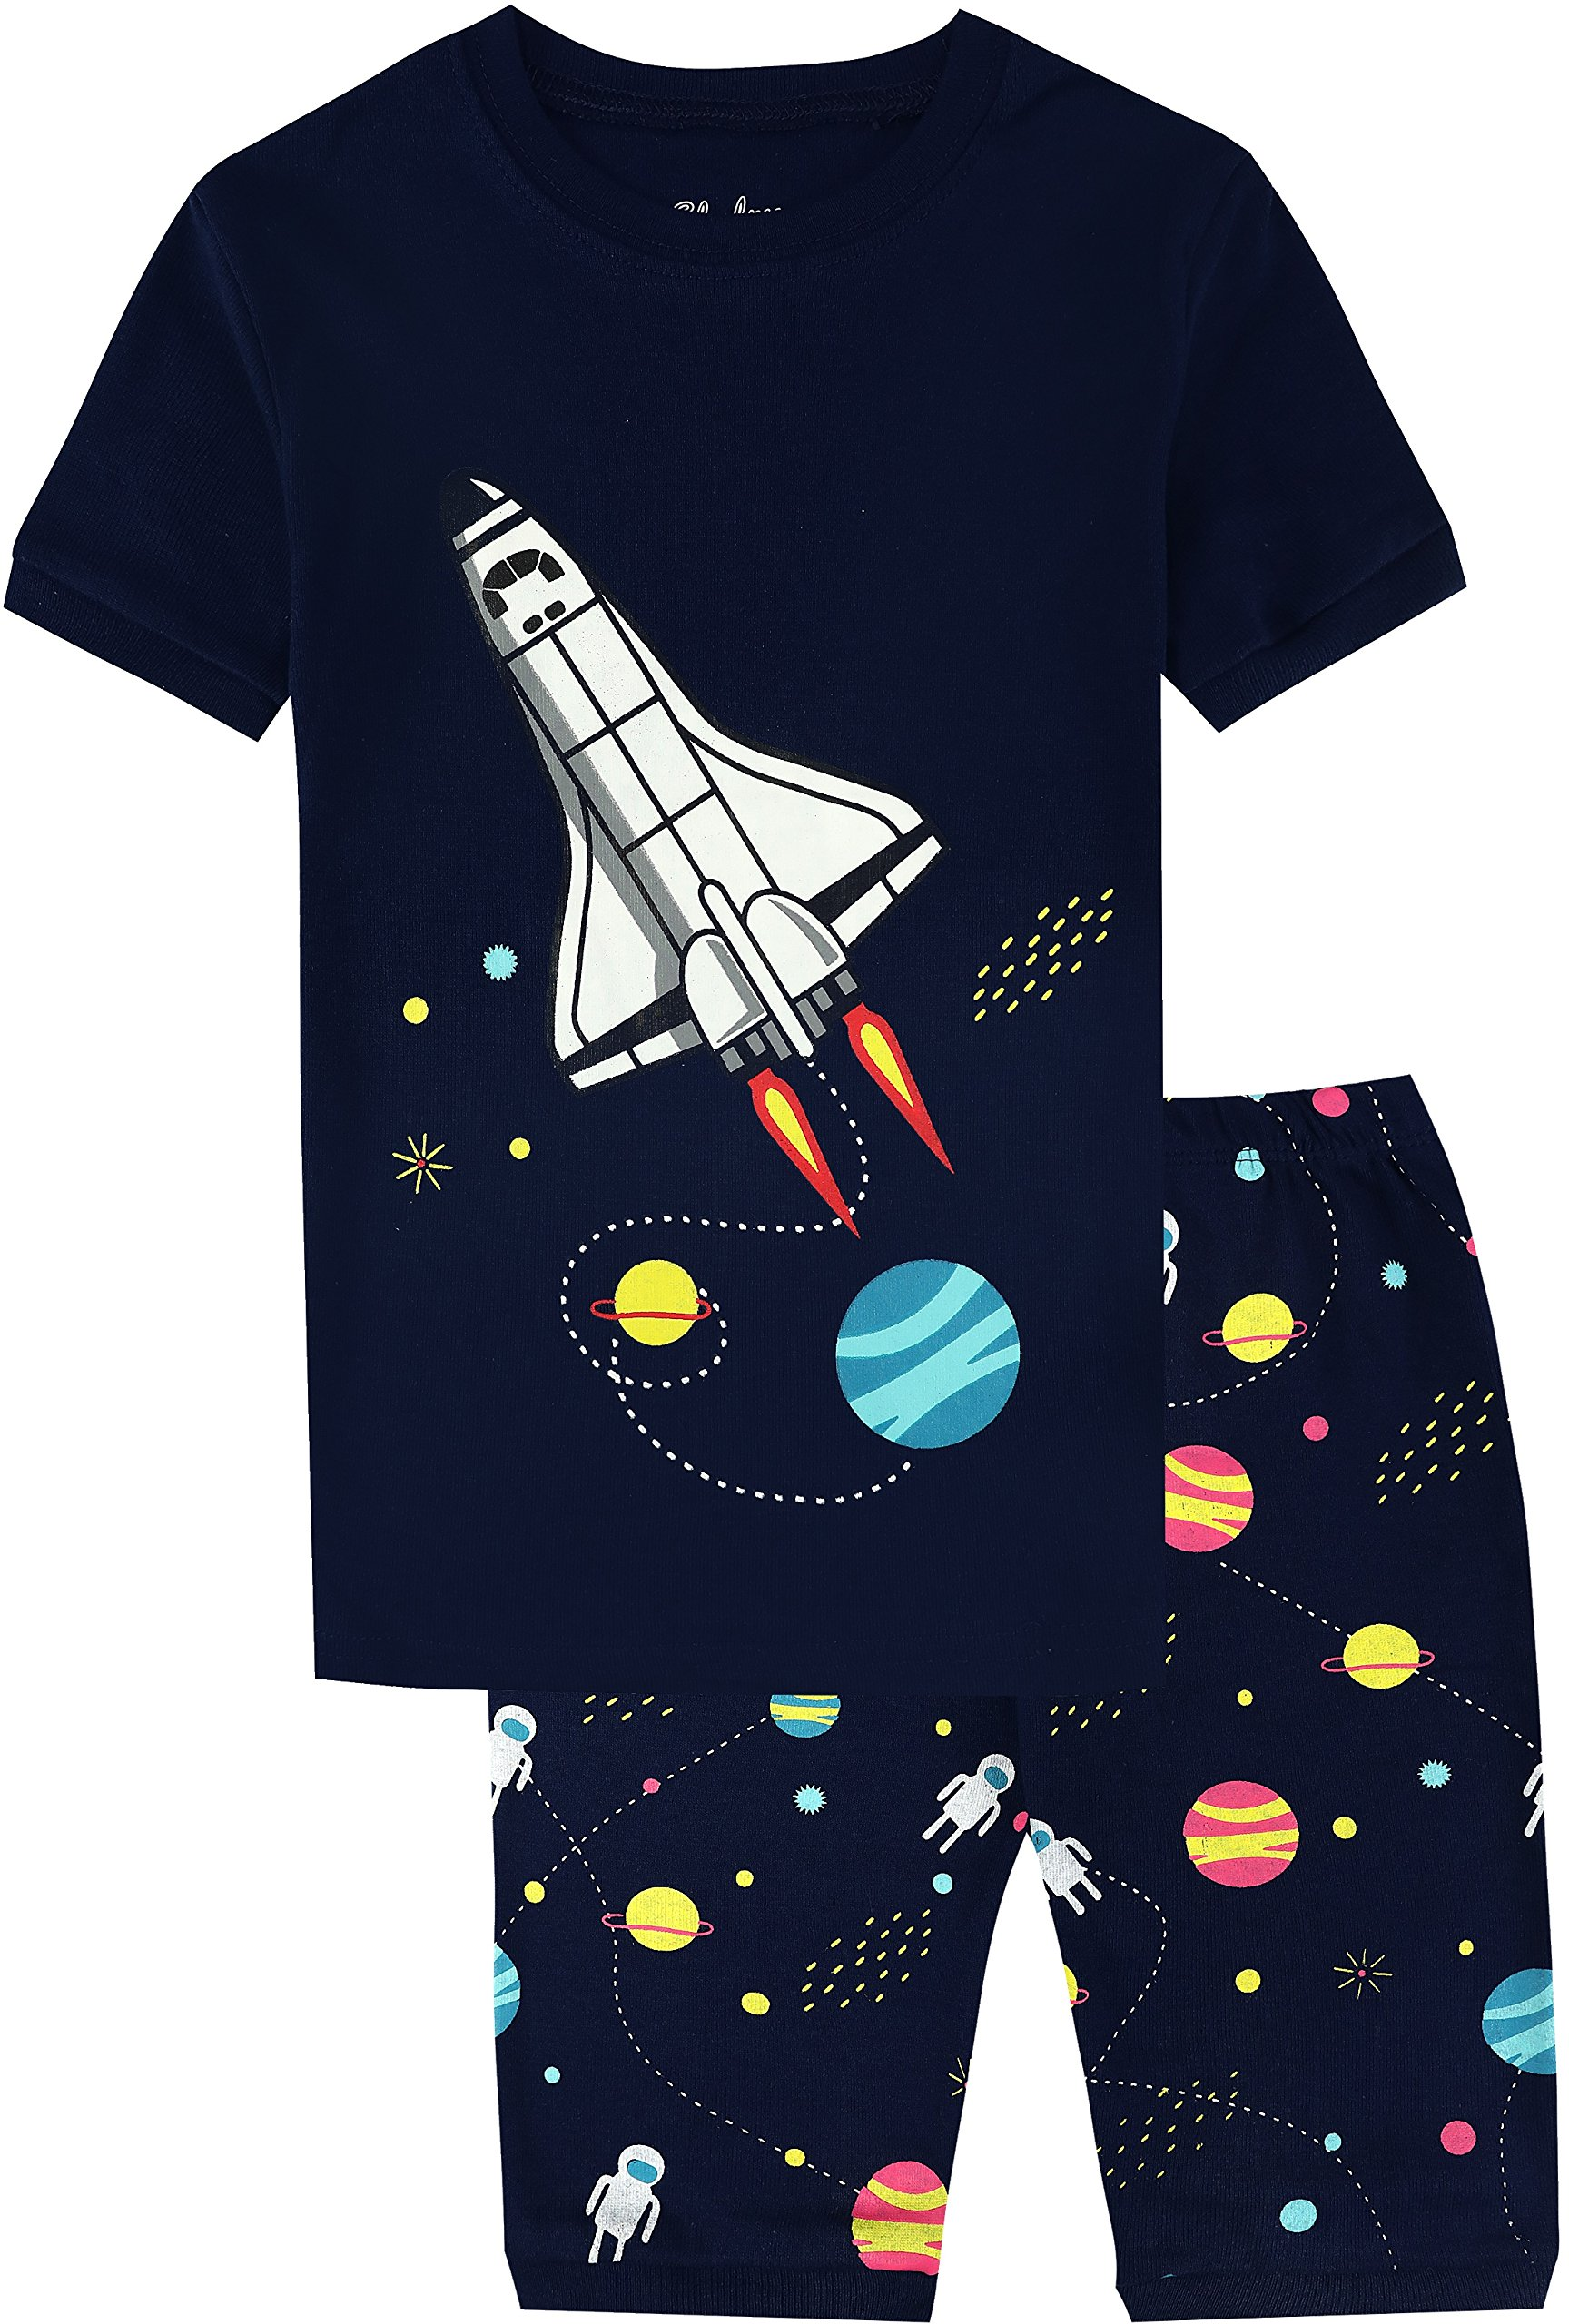 Boys Rocket Pajamas 2 Pieces Short Set 100% Summer Cotton Sleepwear for Kids PJS Size 6